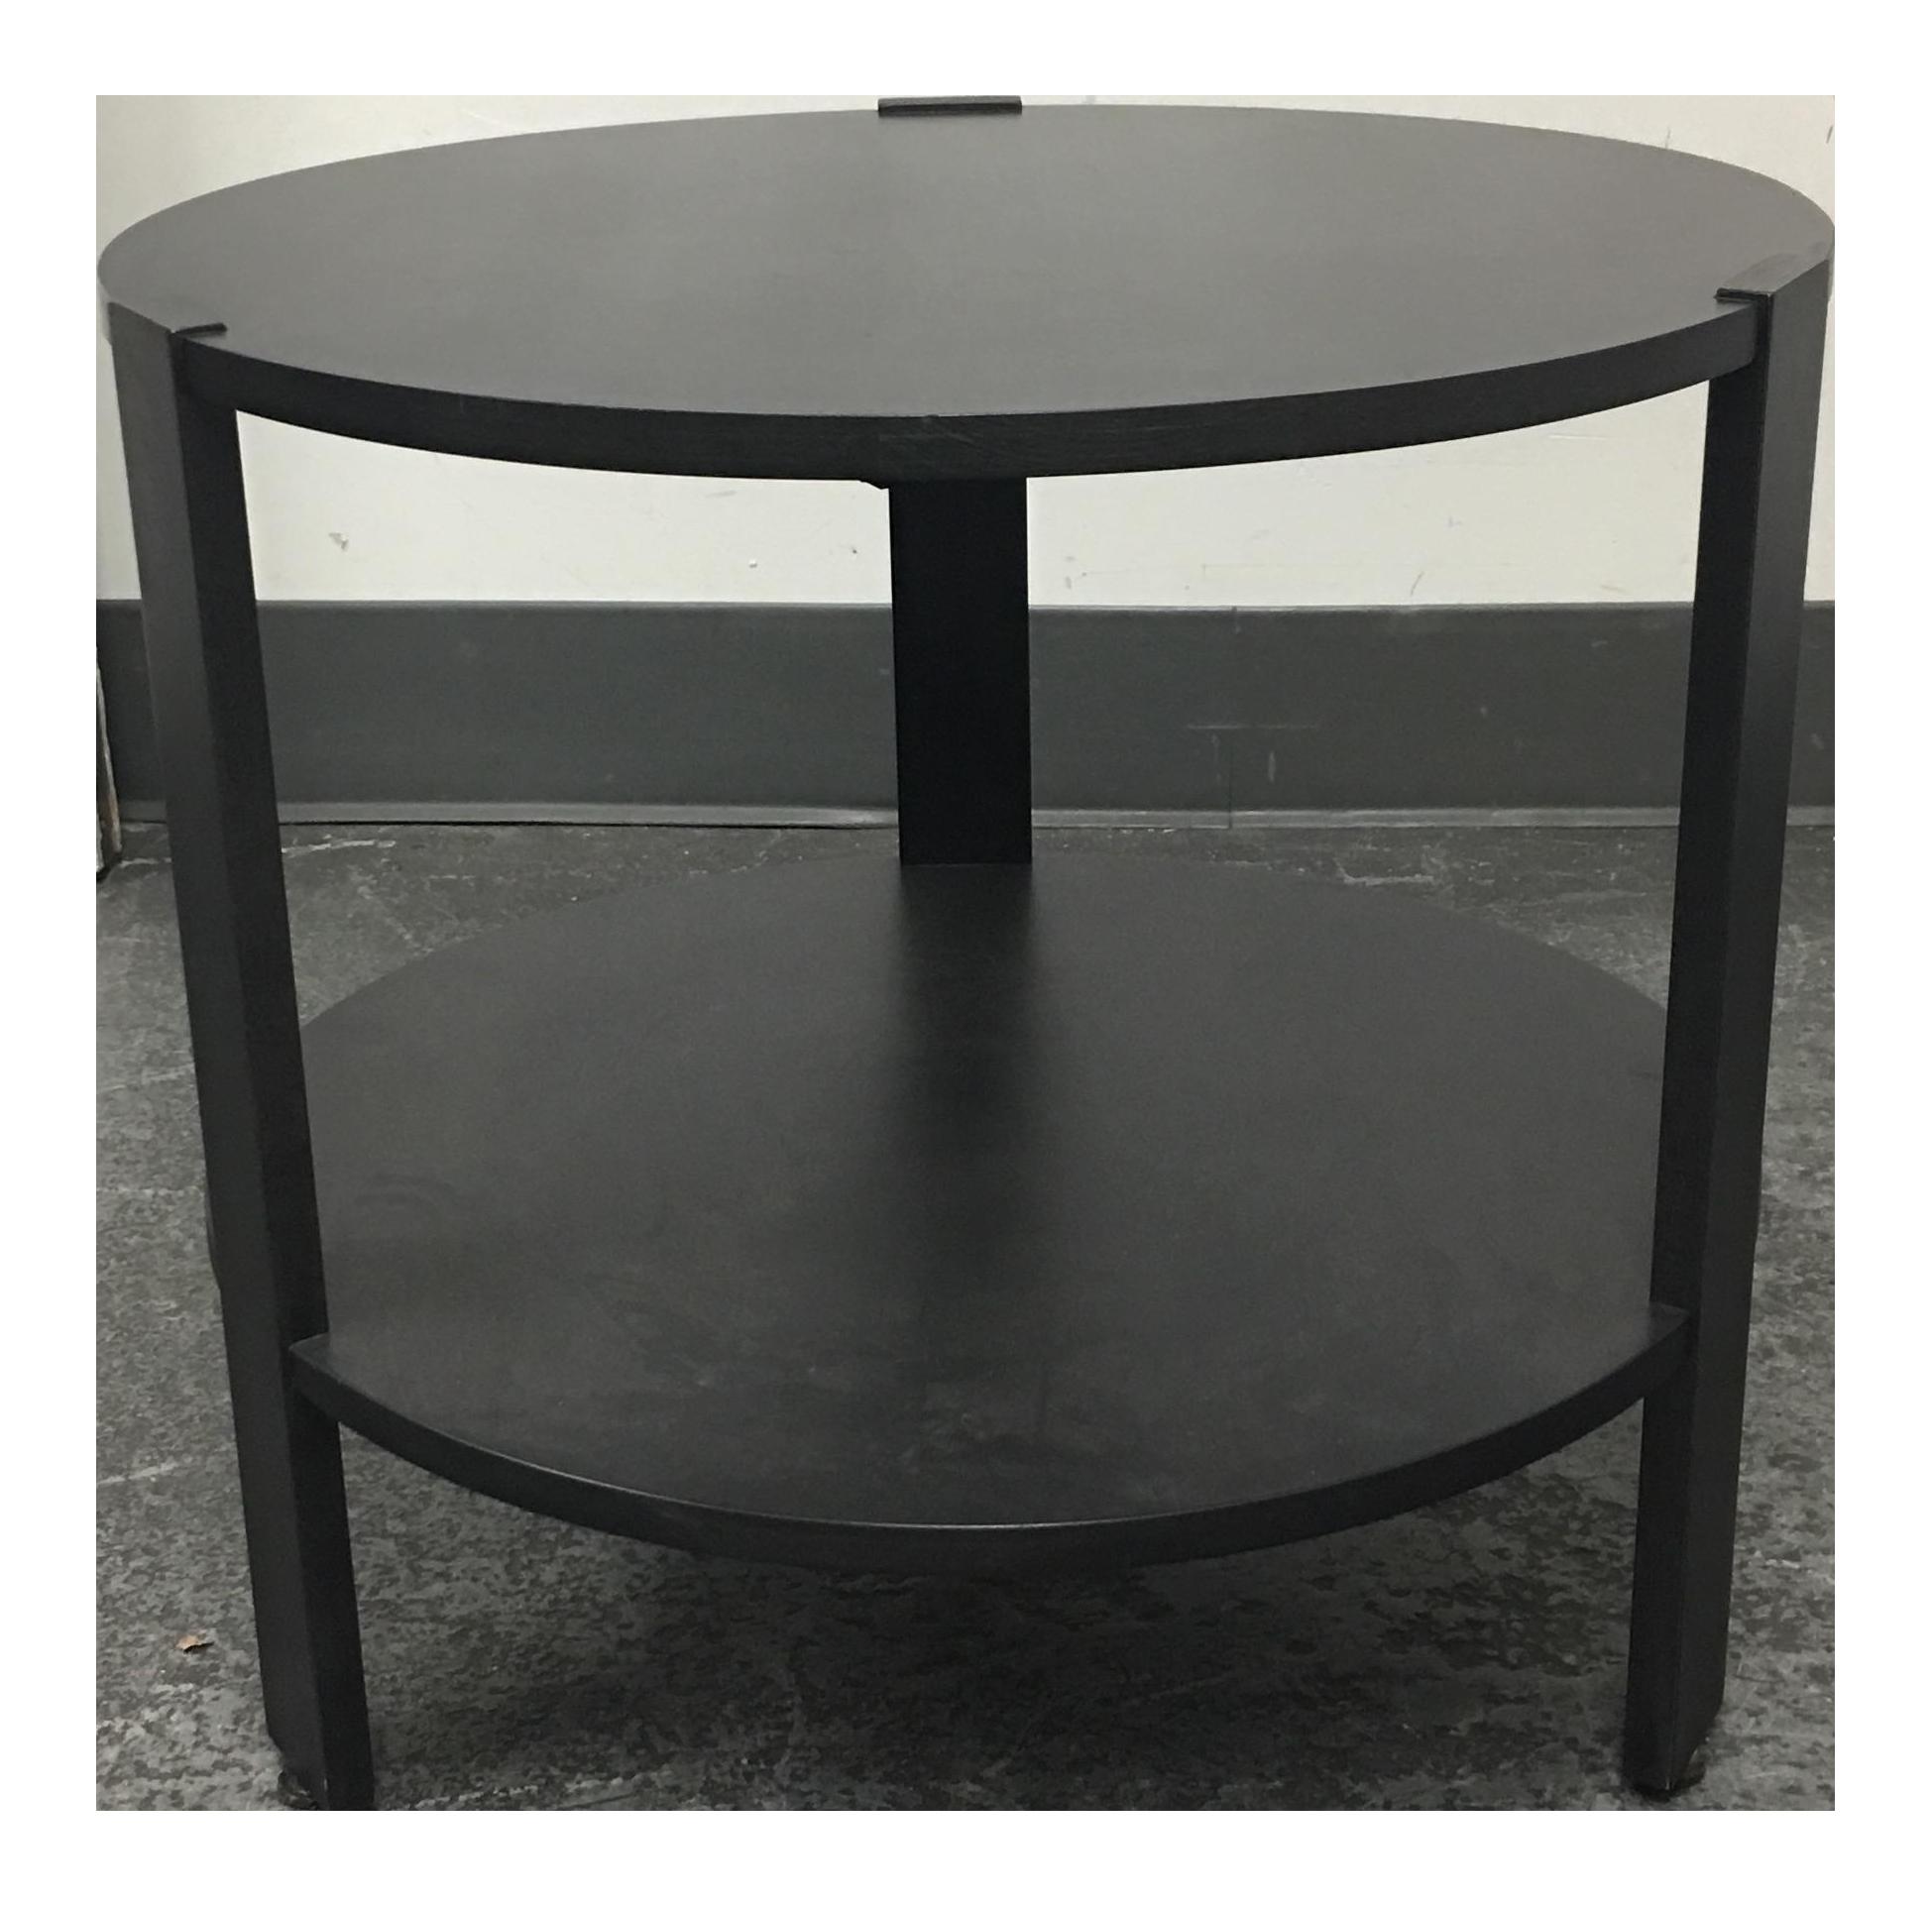 Room Board Greene Side Table On Chairish Com Side Table Table Round Side Table [ 1923 x 1949 Pixel ]